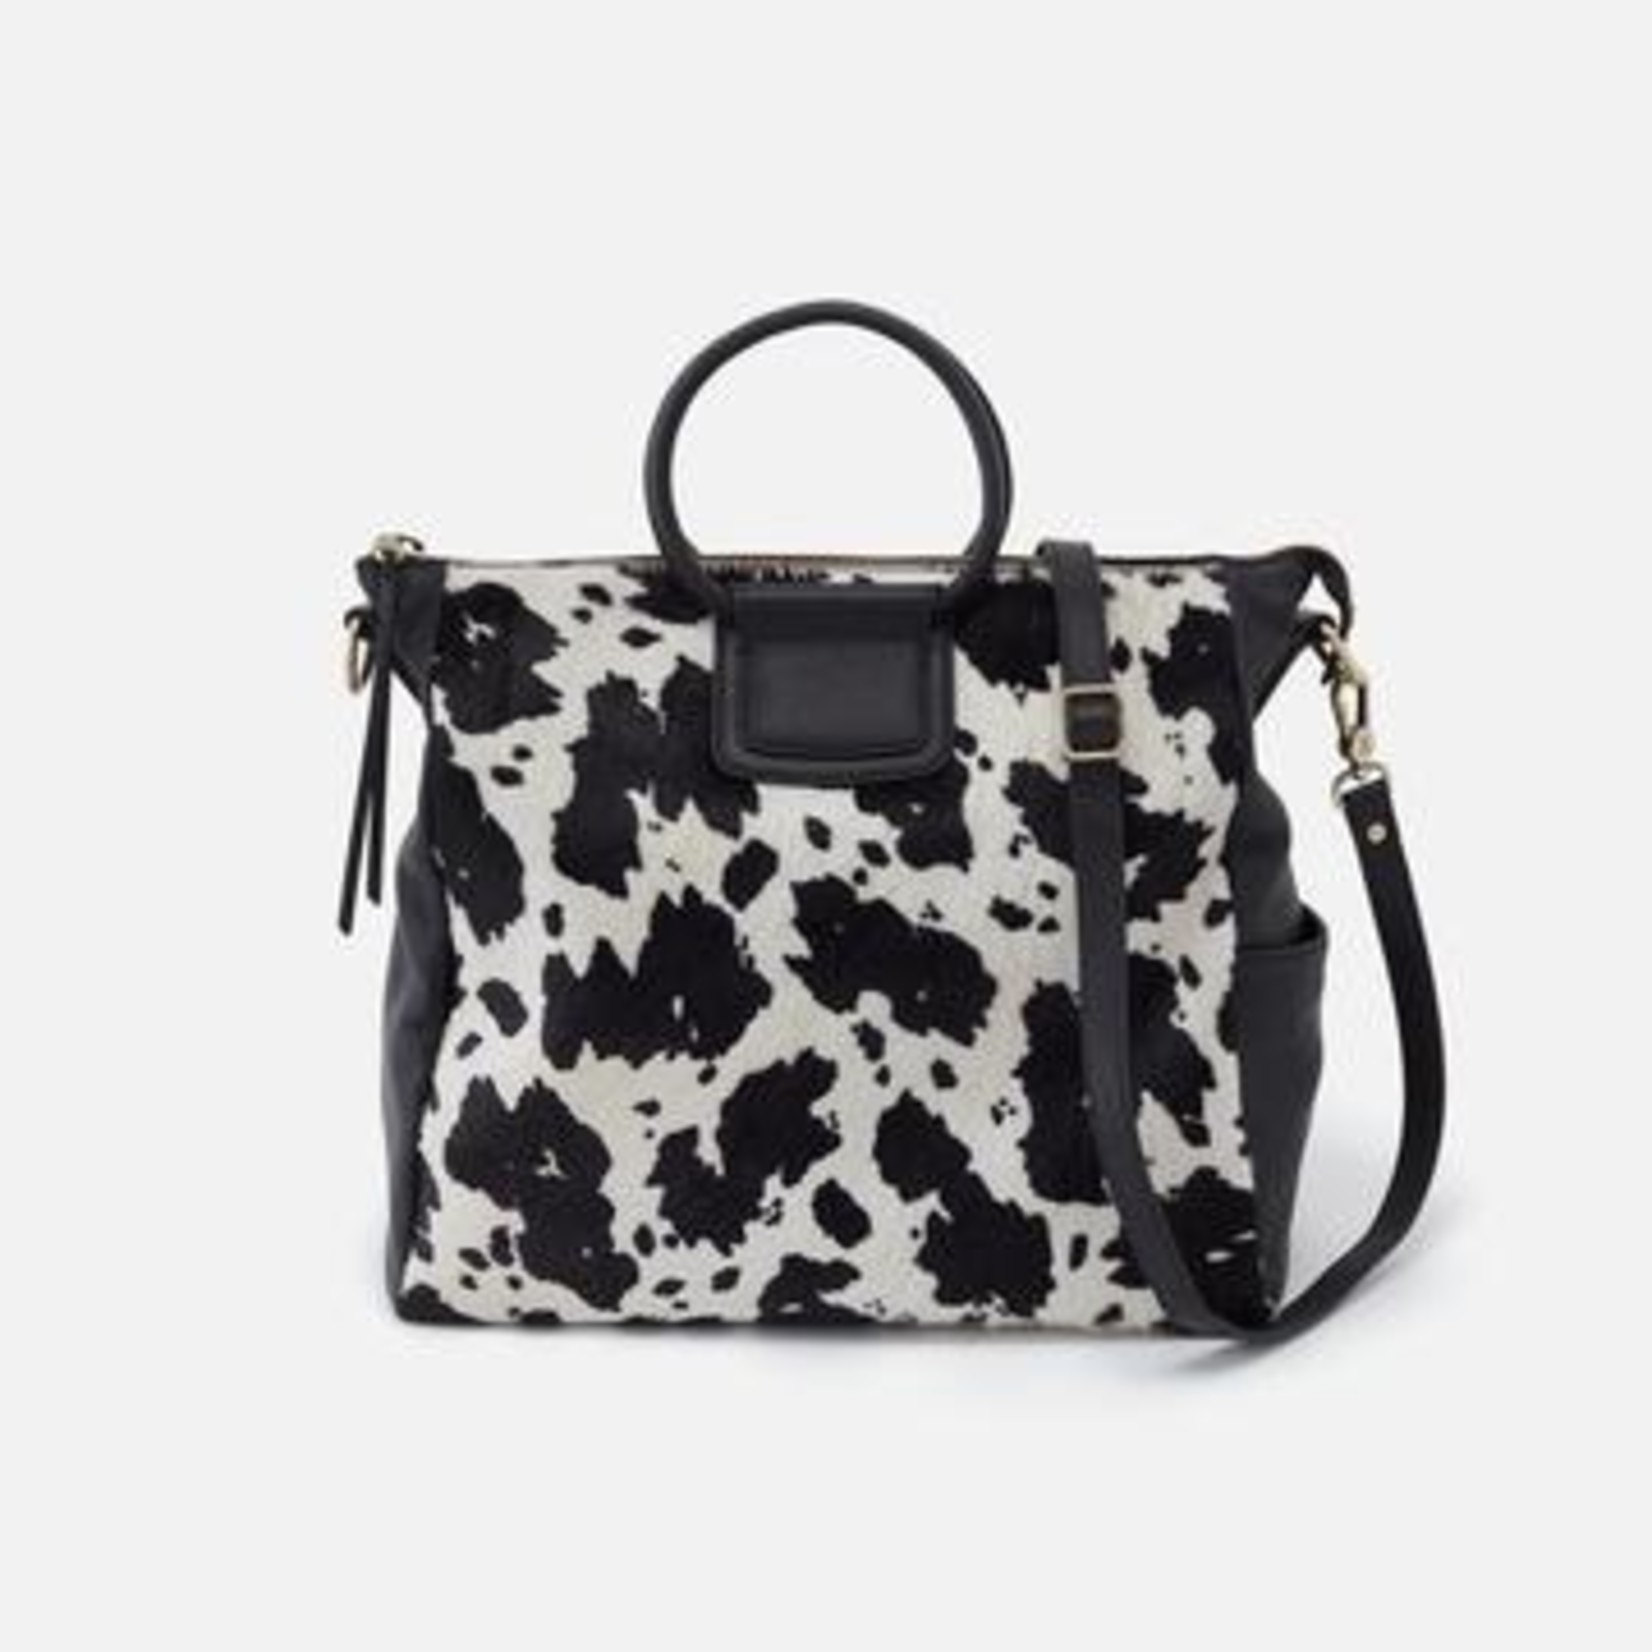 HOBO Bags Sheila Large Satchel Cow Print